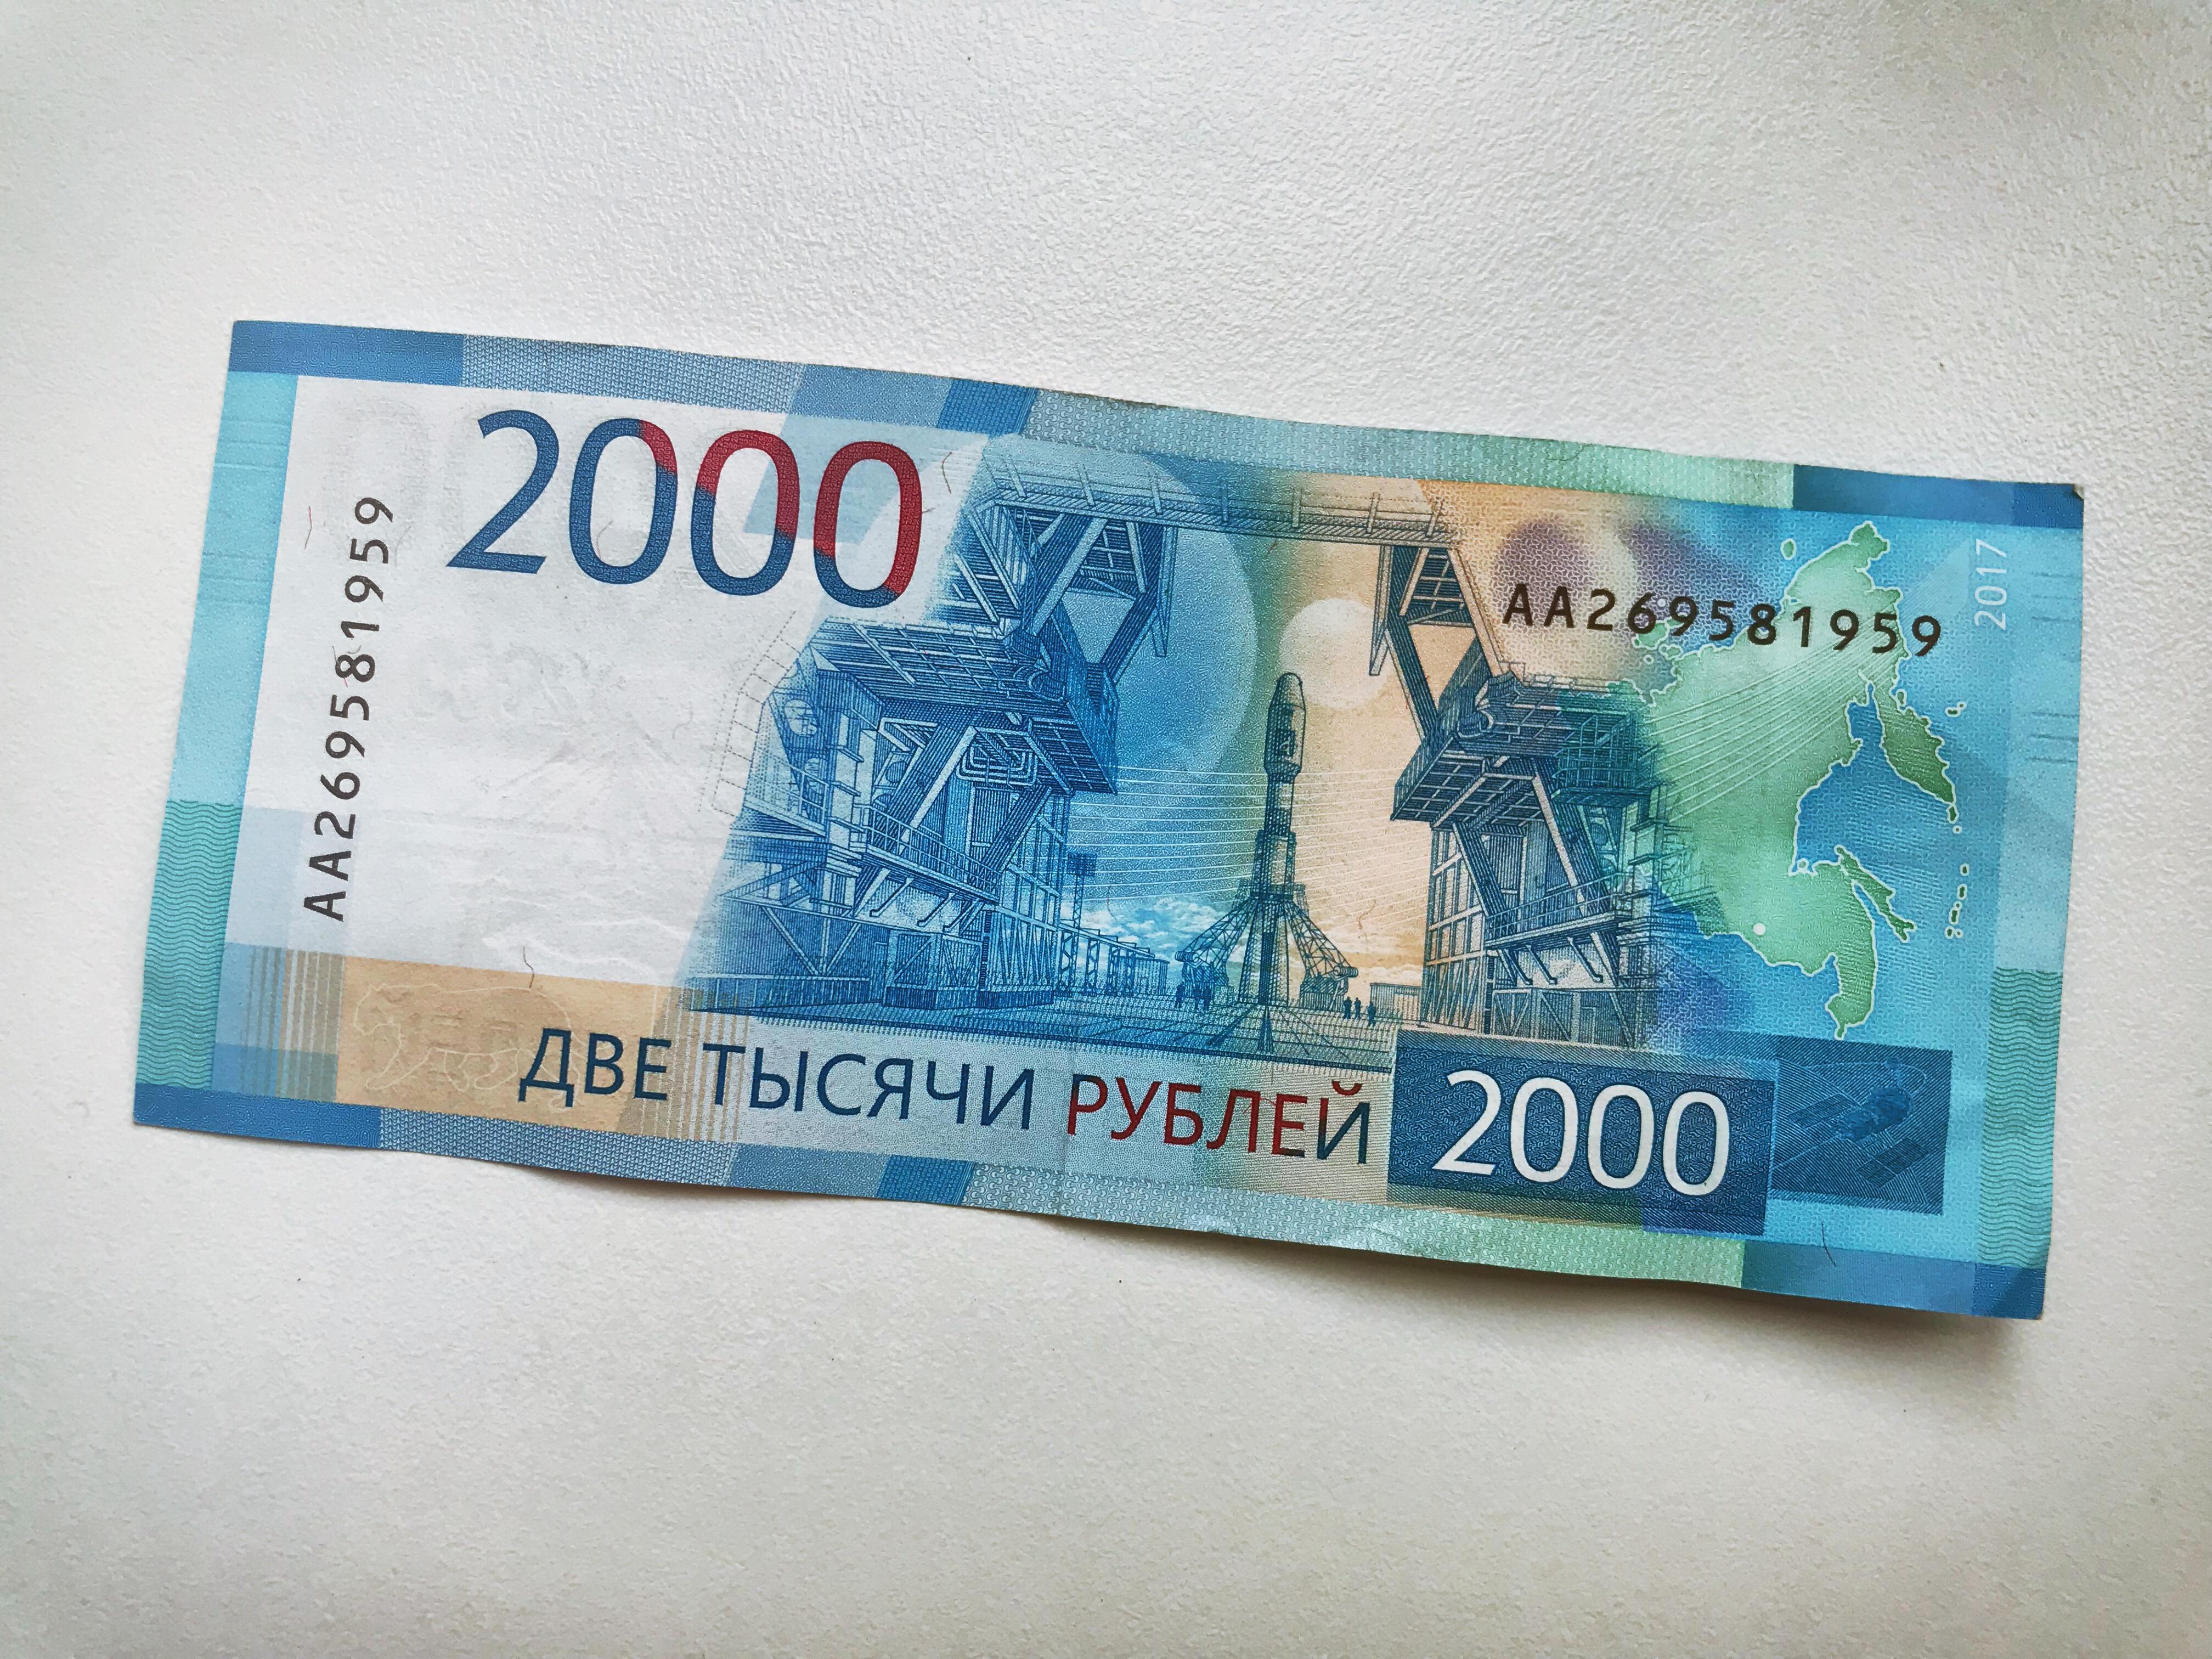 2000 rubel augmented reality wostotschny